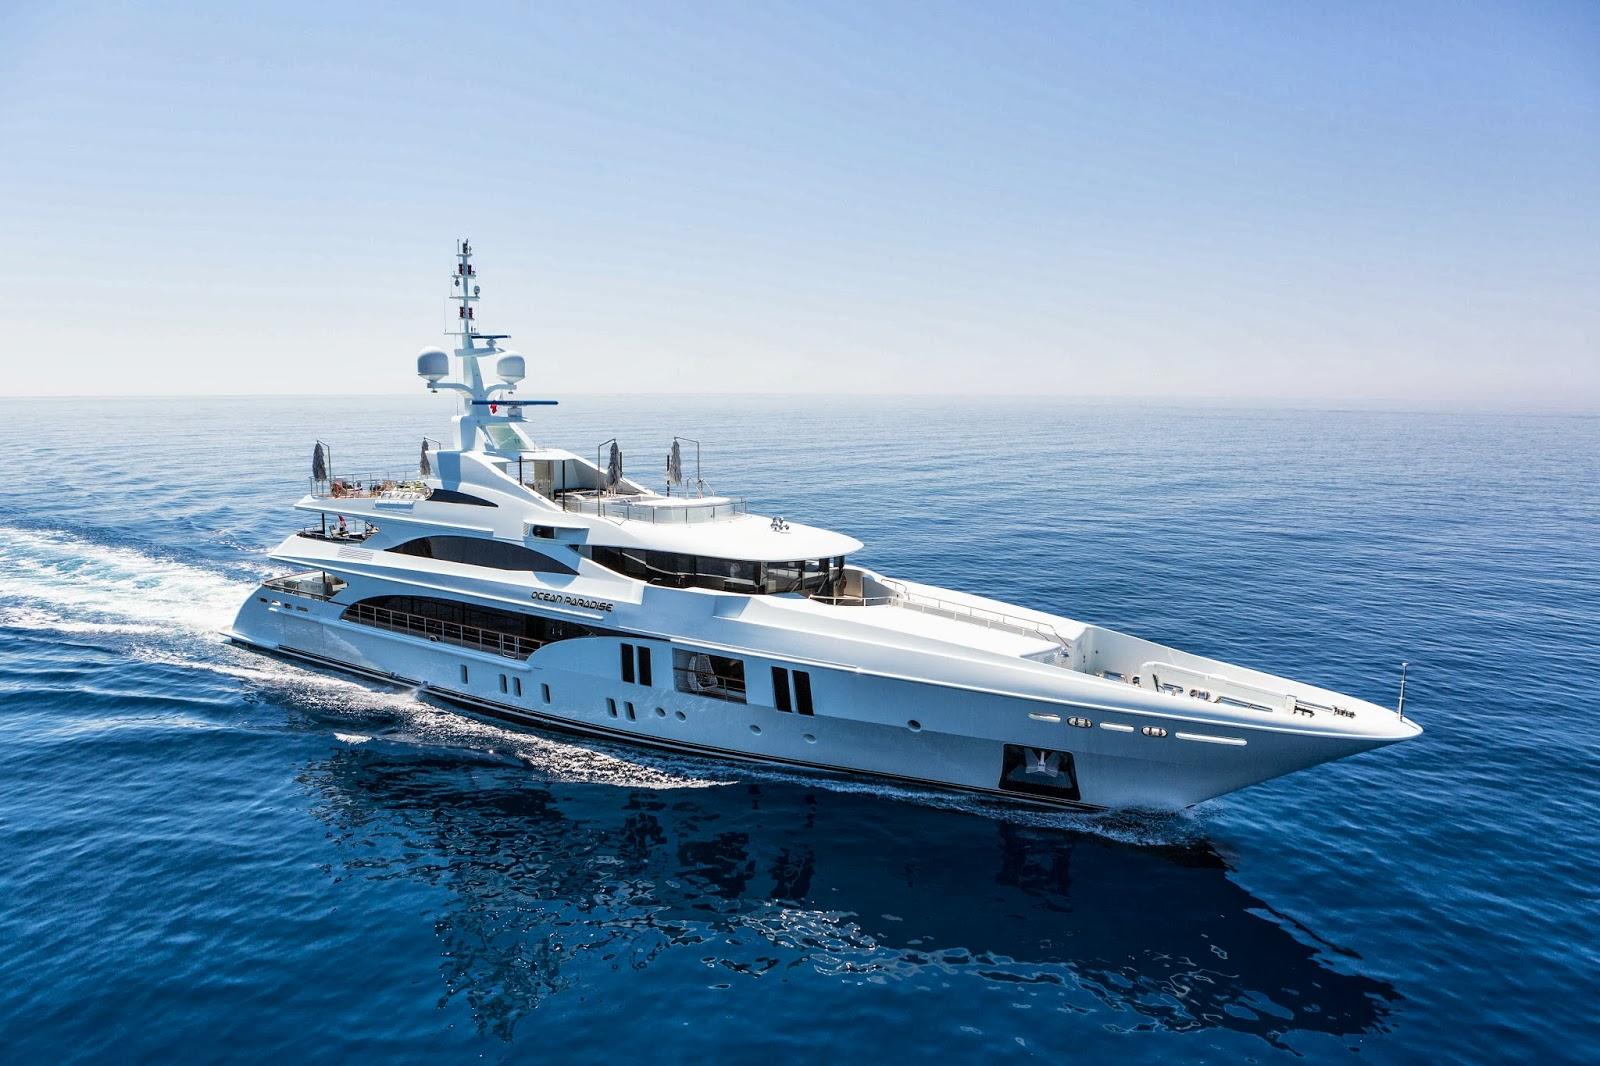 Benetti al Monaco Yacht Show 2013